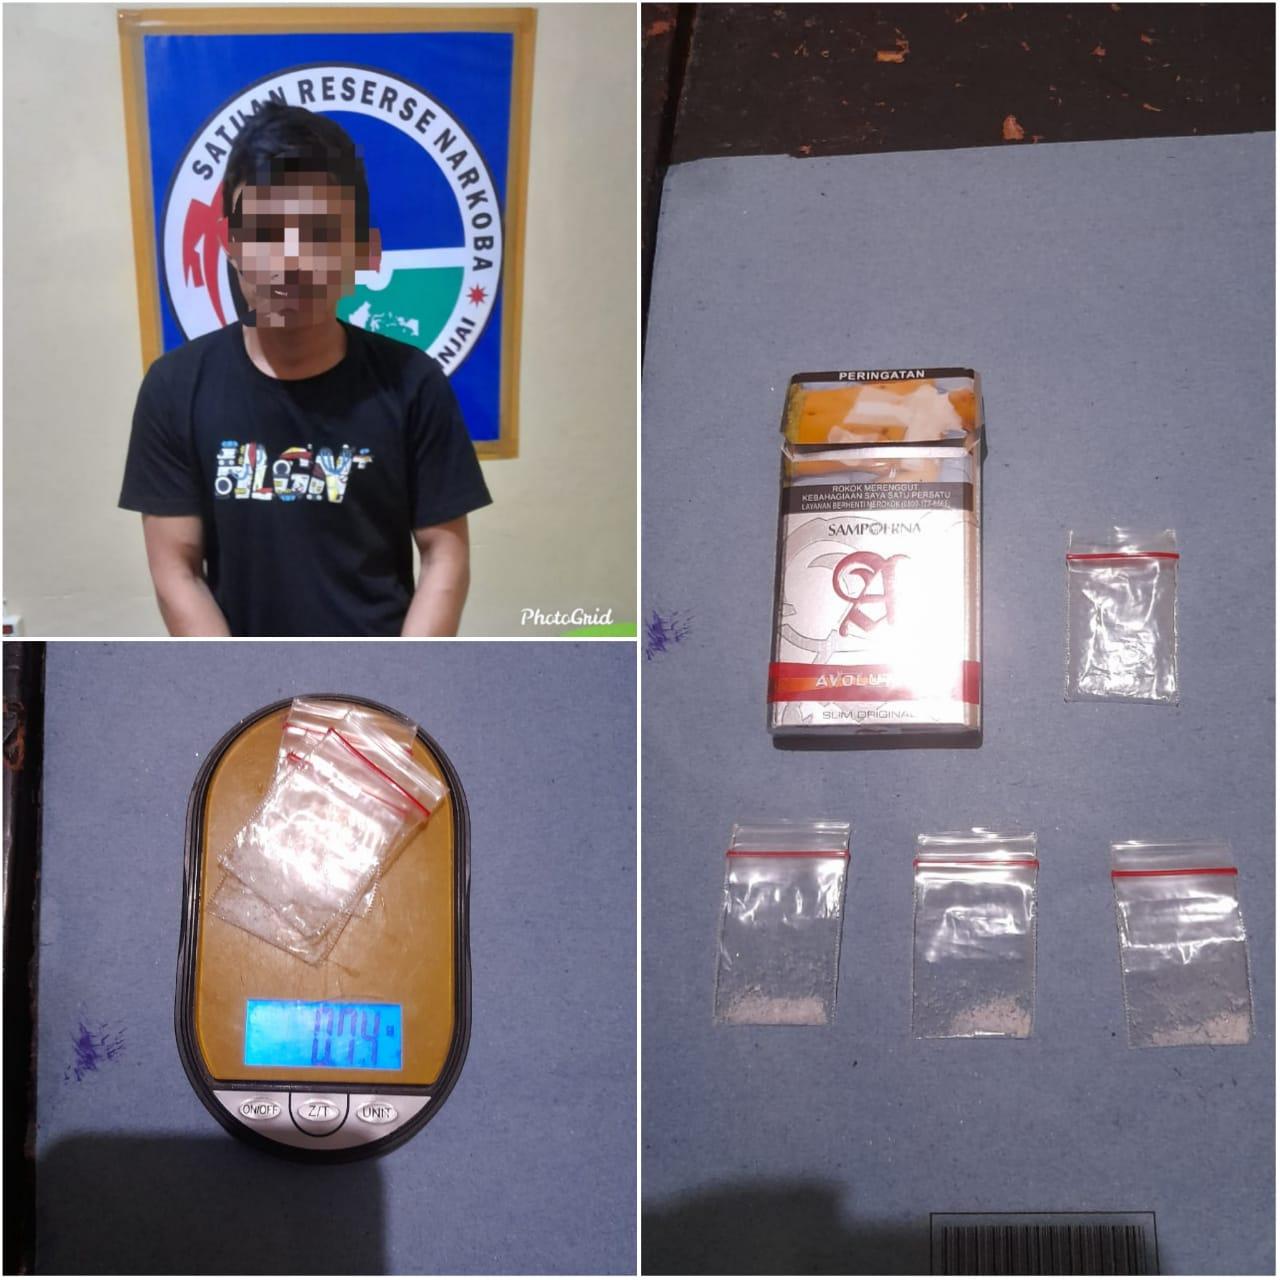 Miliki Sabu, Warga Bone Diringkus Sat Narkoba Polres Sinjai di Kamar Hotel